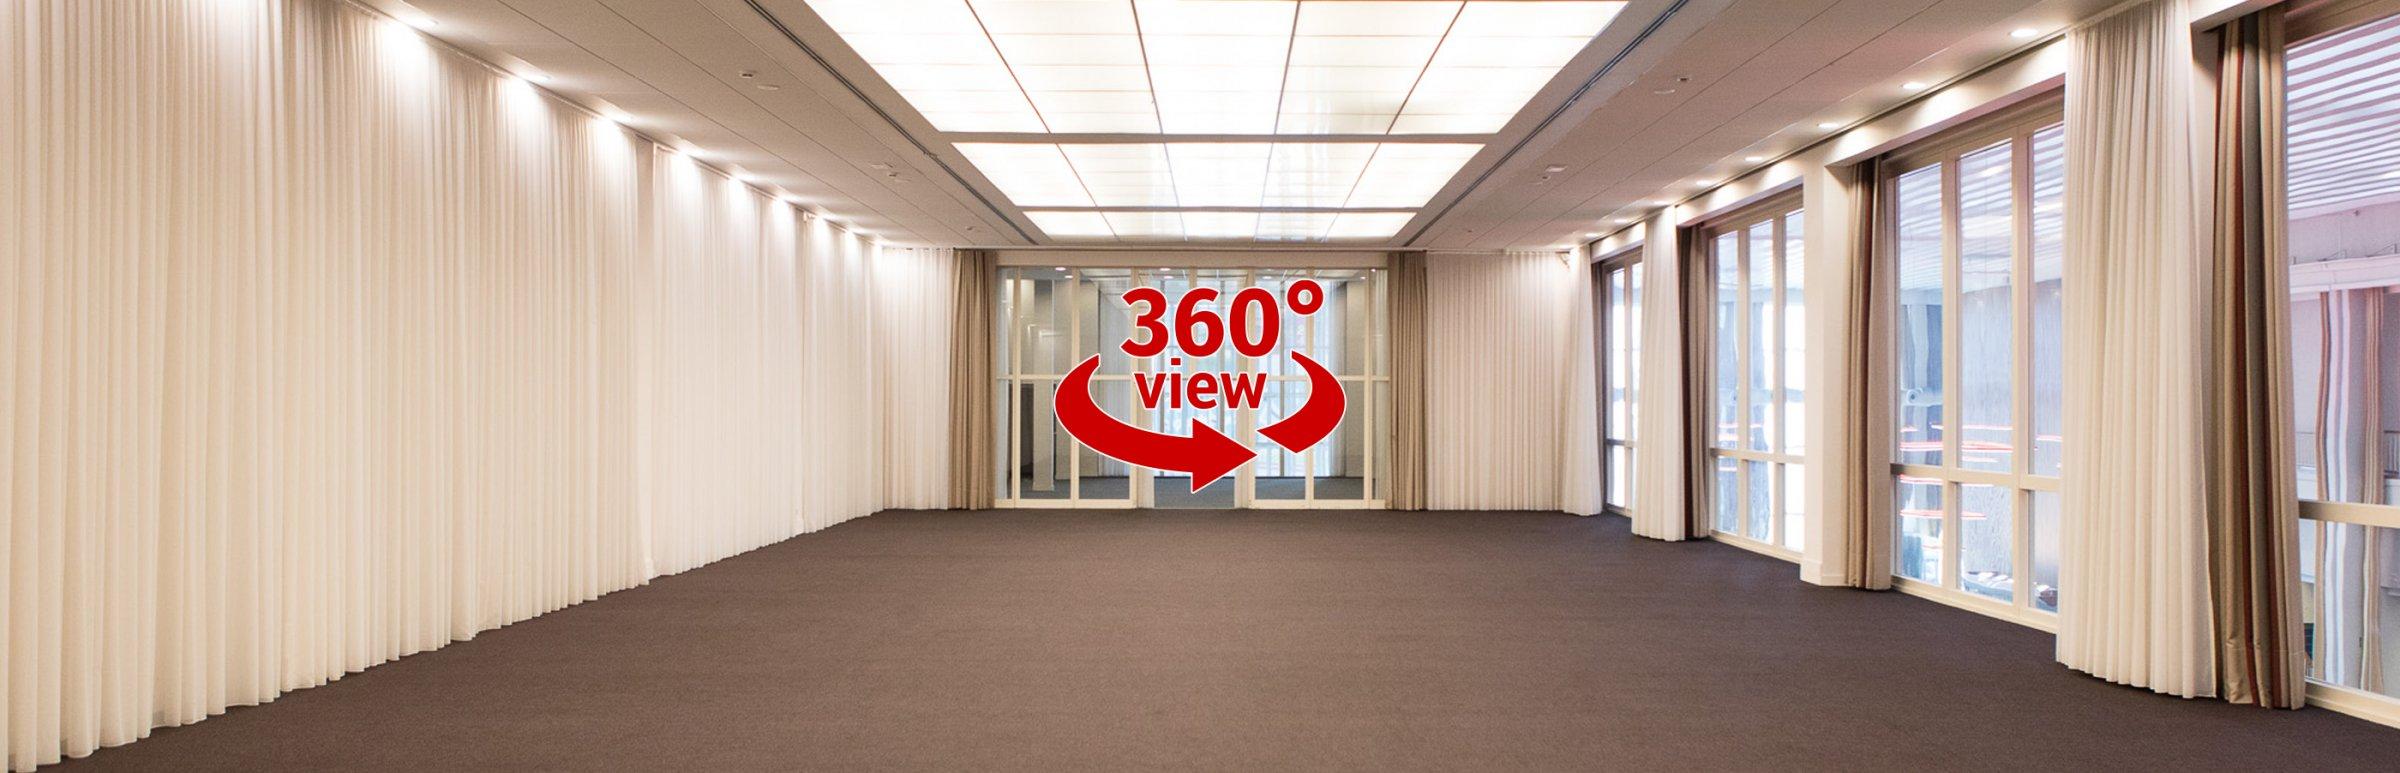 360 graden Ridderzaal